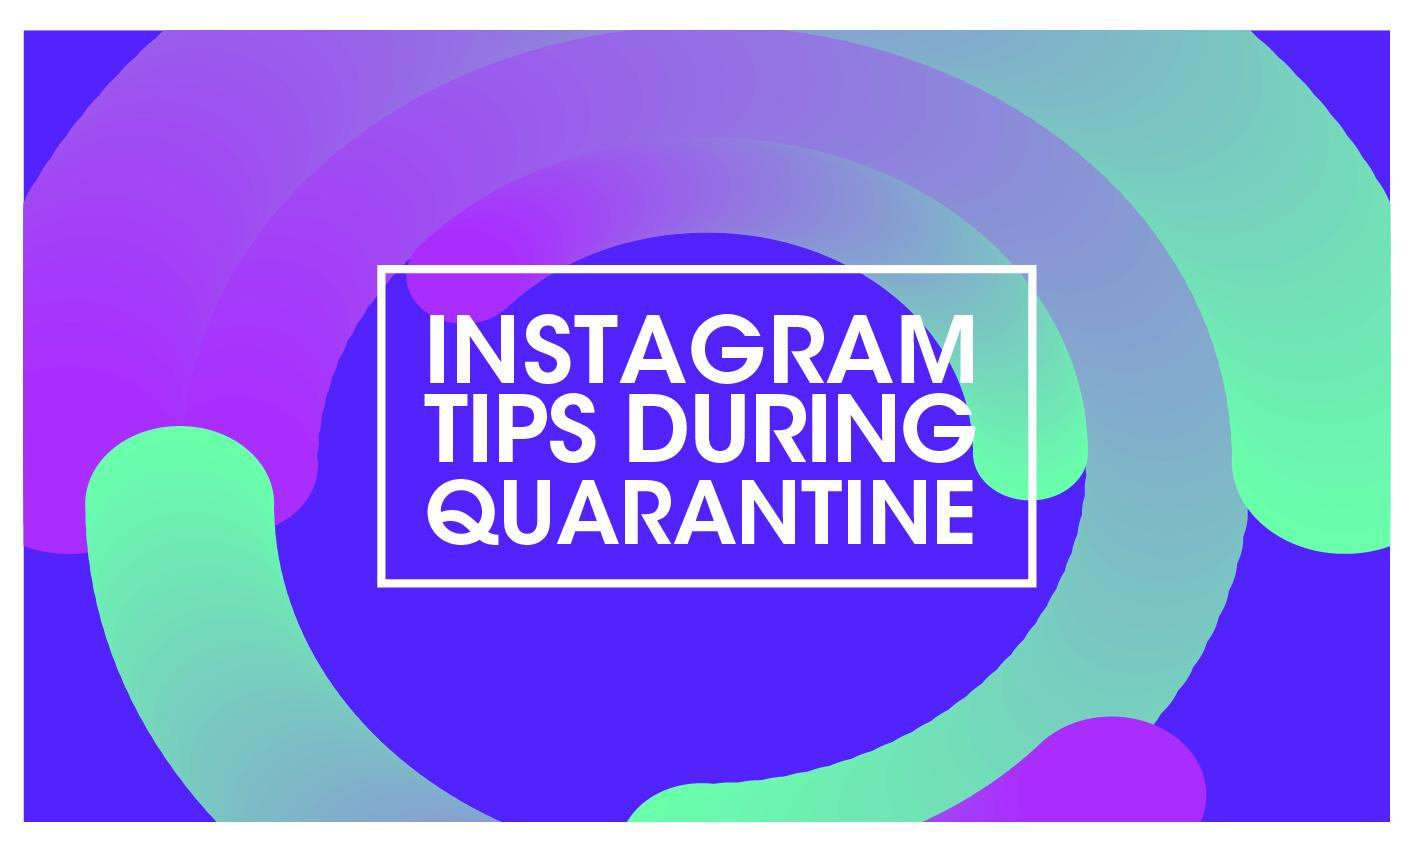 INSTAGRAM TIPS DURING QUARANTINE - News